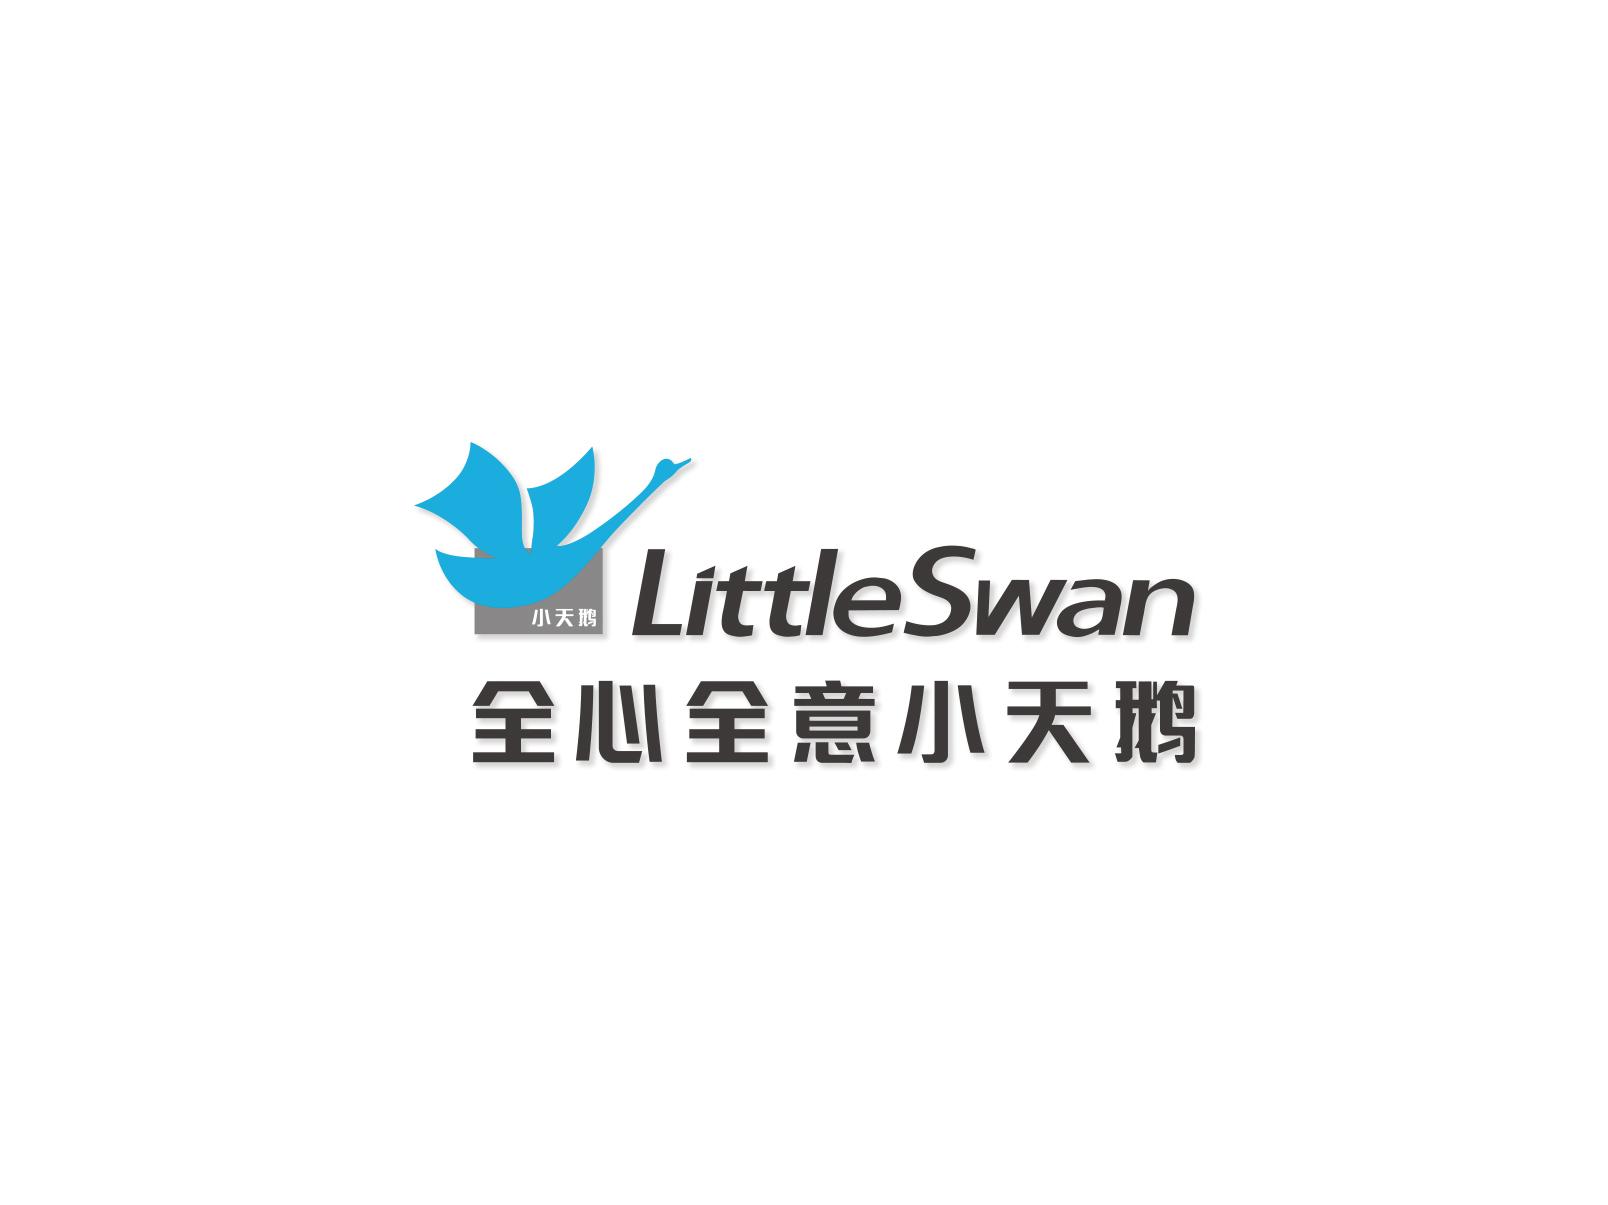 Little Swan Store Design | Home Apliances Retail Interior Design